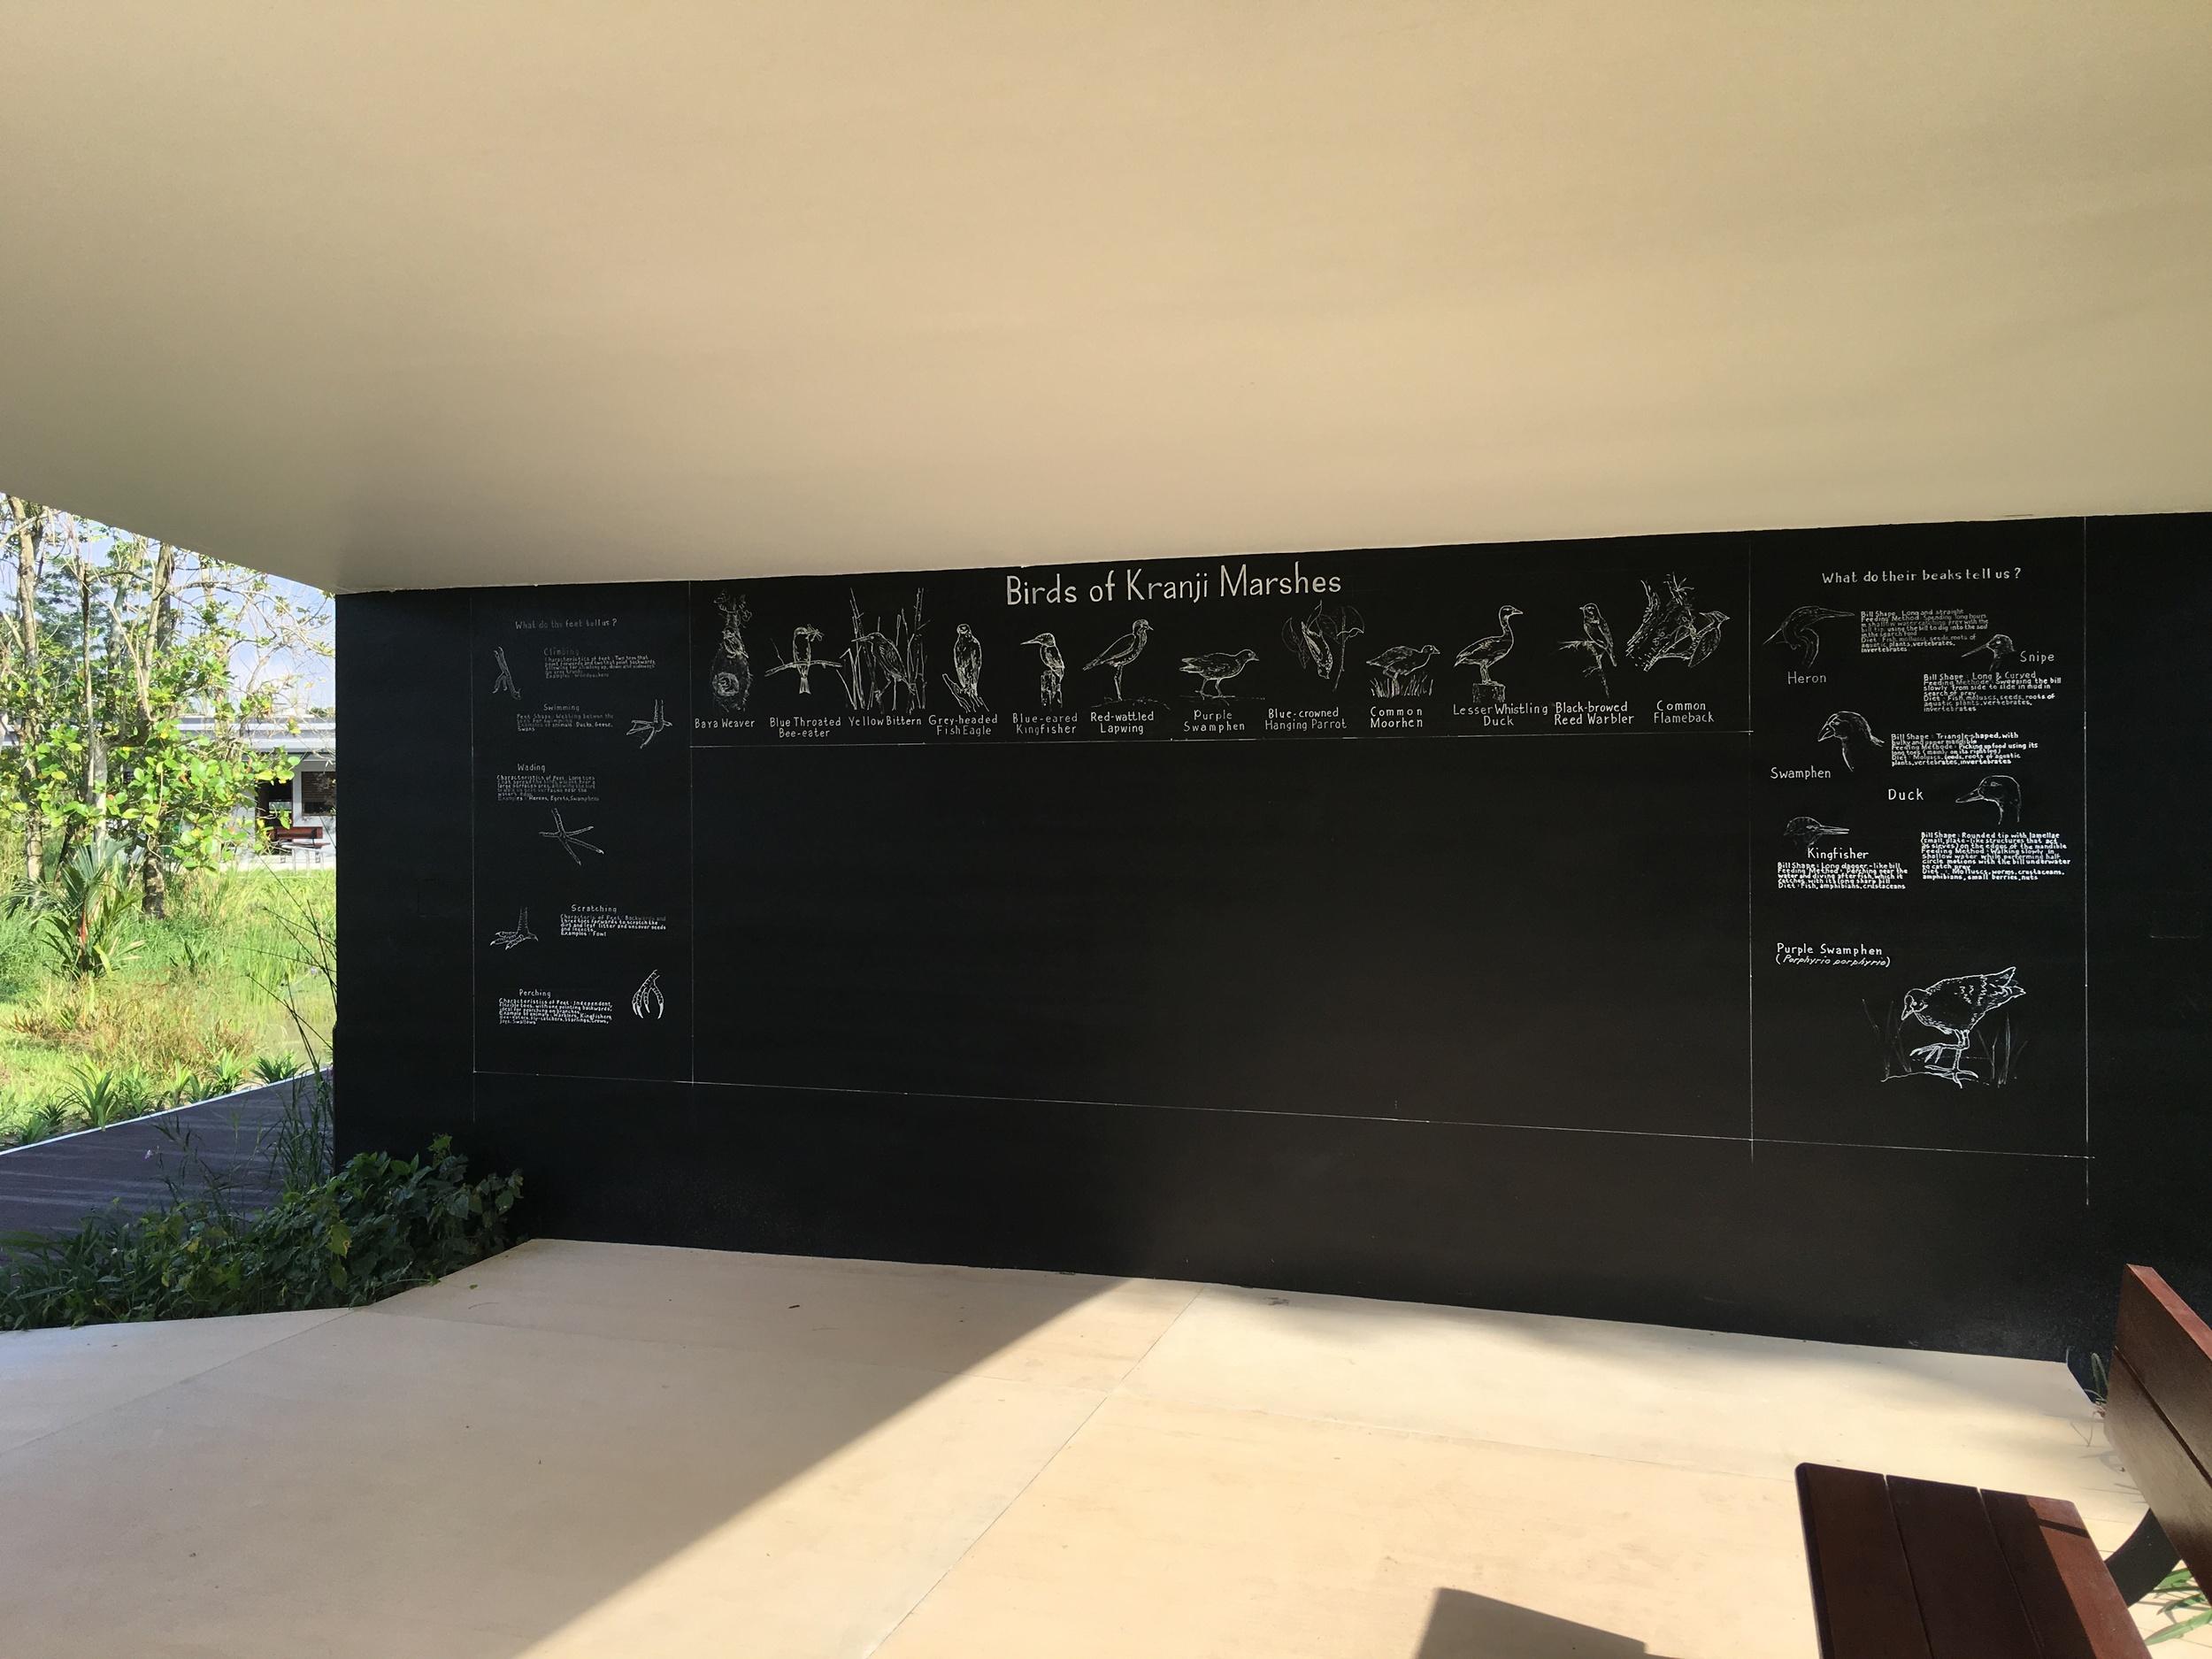 Classroom blackboard at Kranji Gate with Bird illustrations